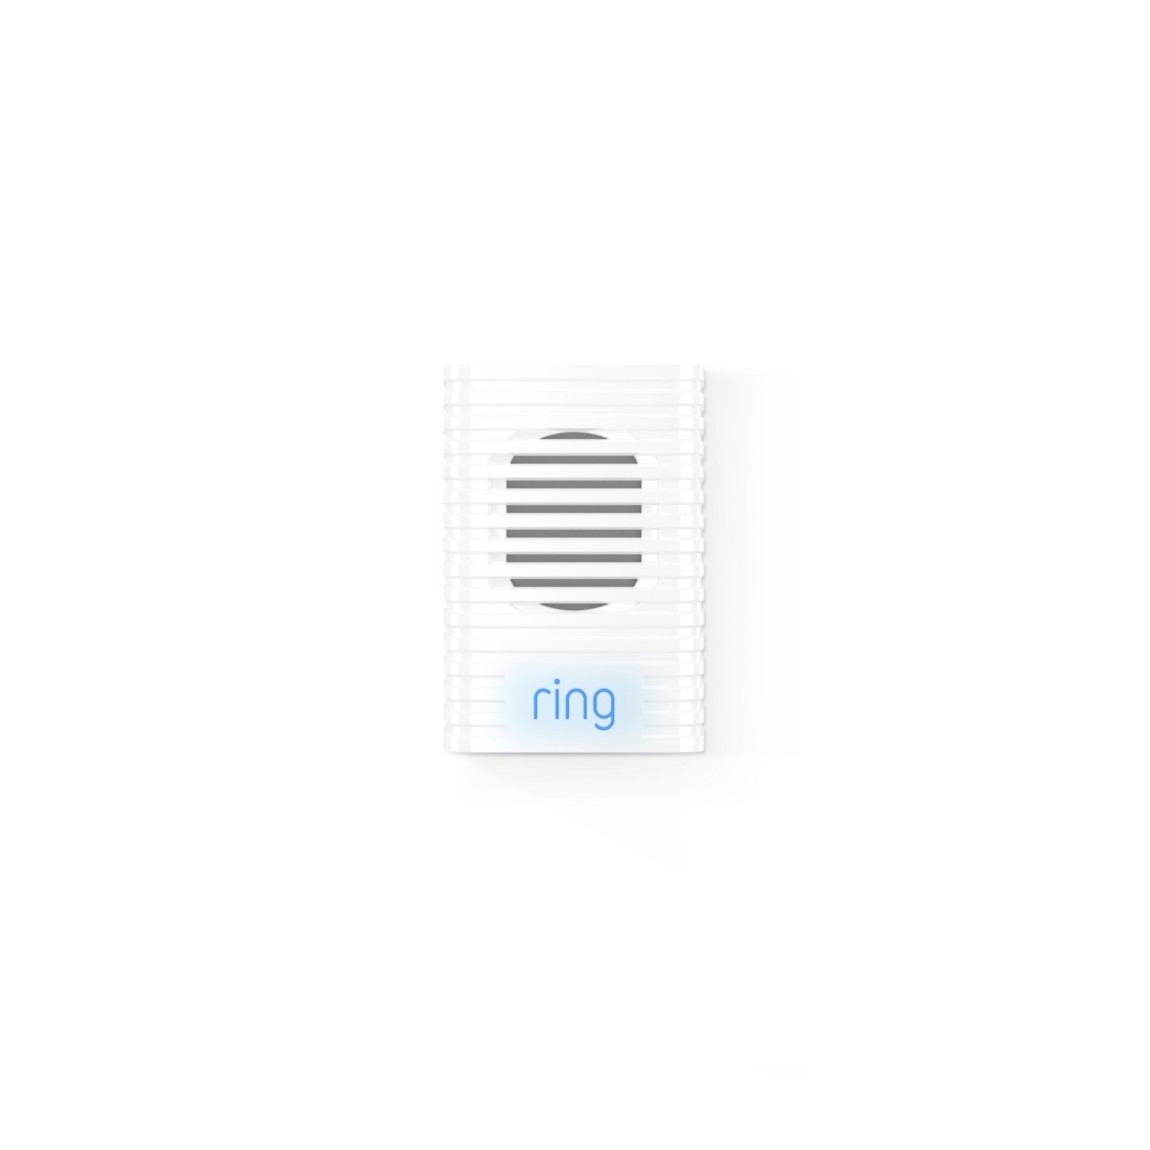 Ring Chime - WLAN Türgong für Video-Türklingel